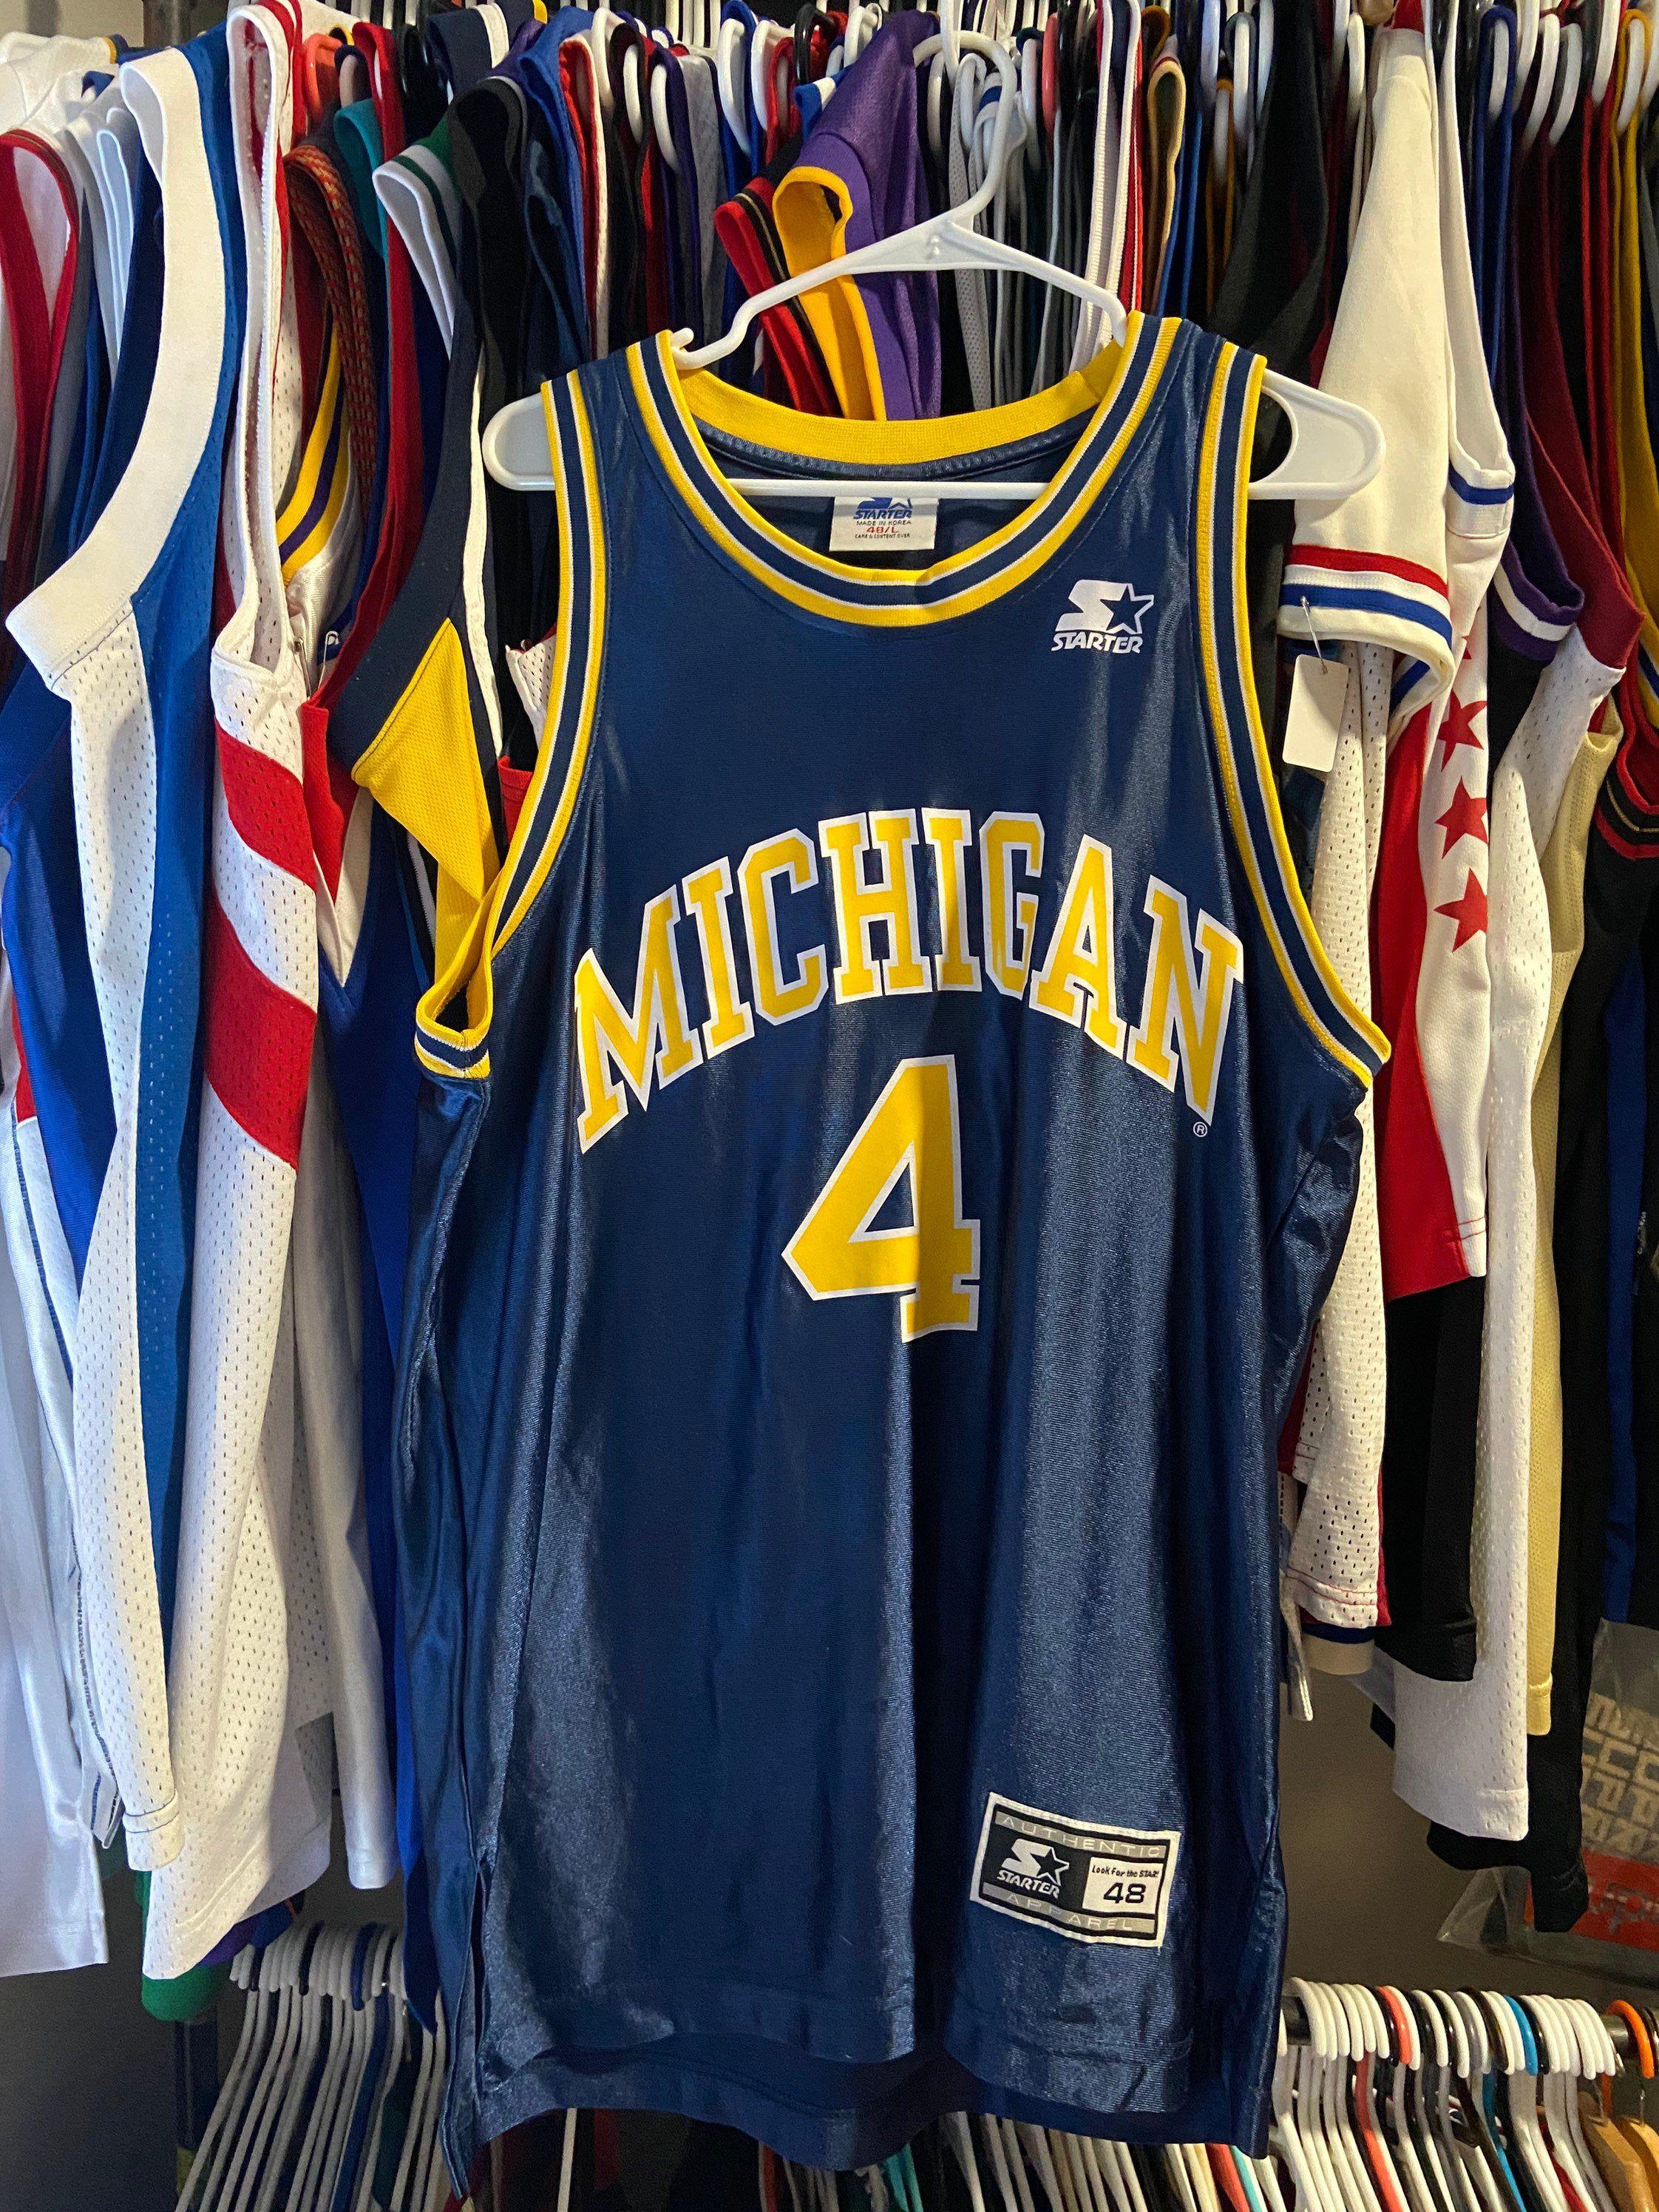 Rare Vintage Starter Mens Large Navy Blue Michigan Wolverines Chris Webber Throwback Basketball Jersey In 2020 Basketball Jersey Michigan Wolverines Jersey